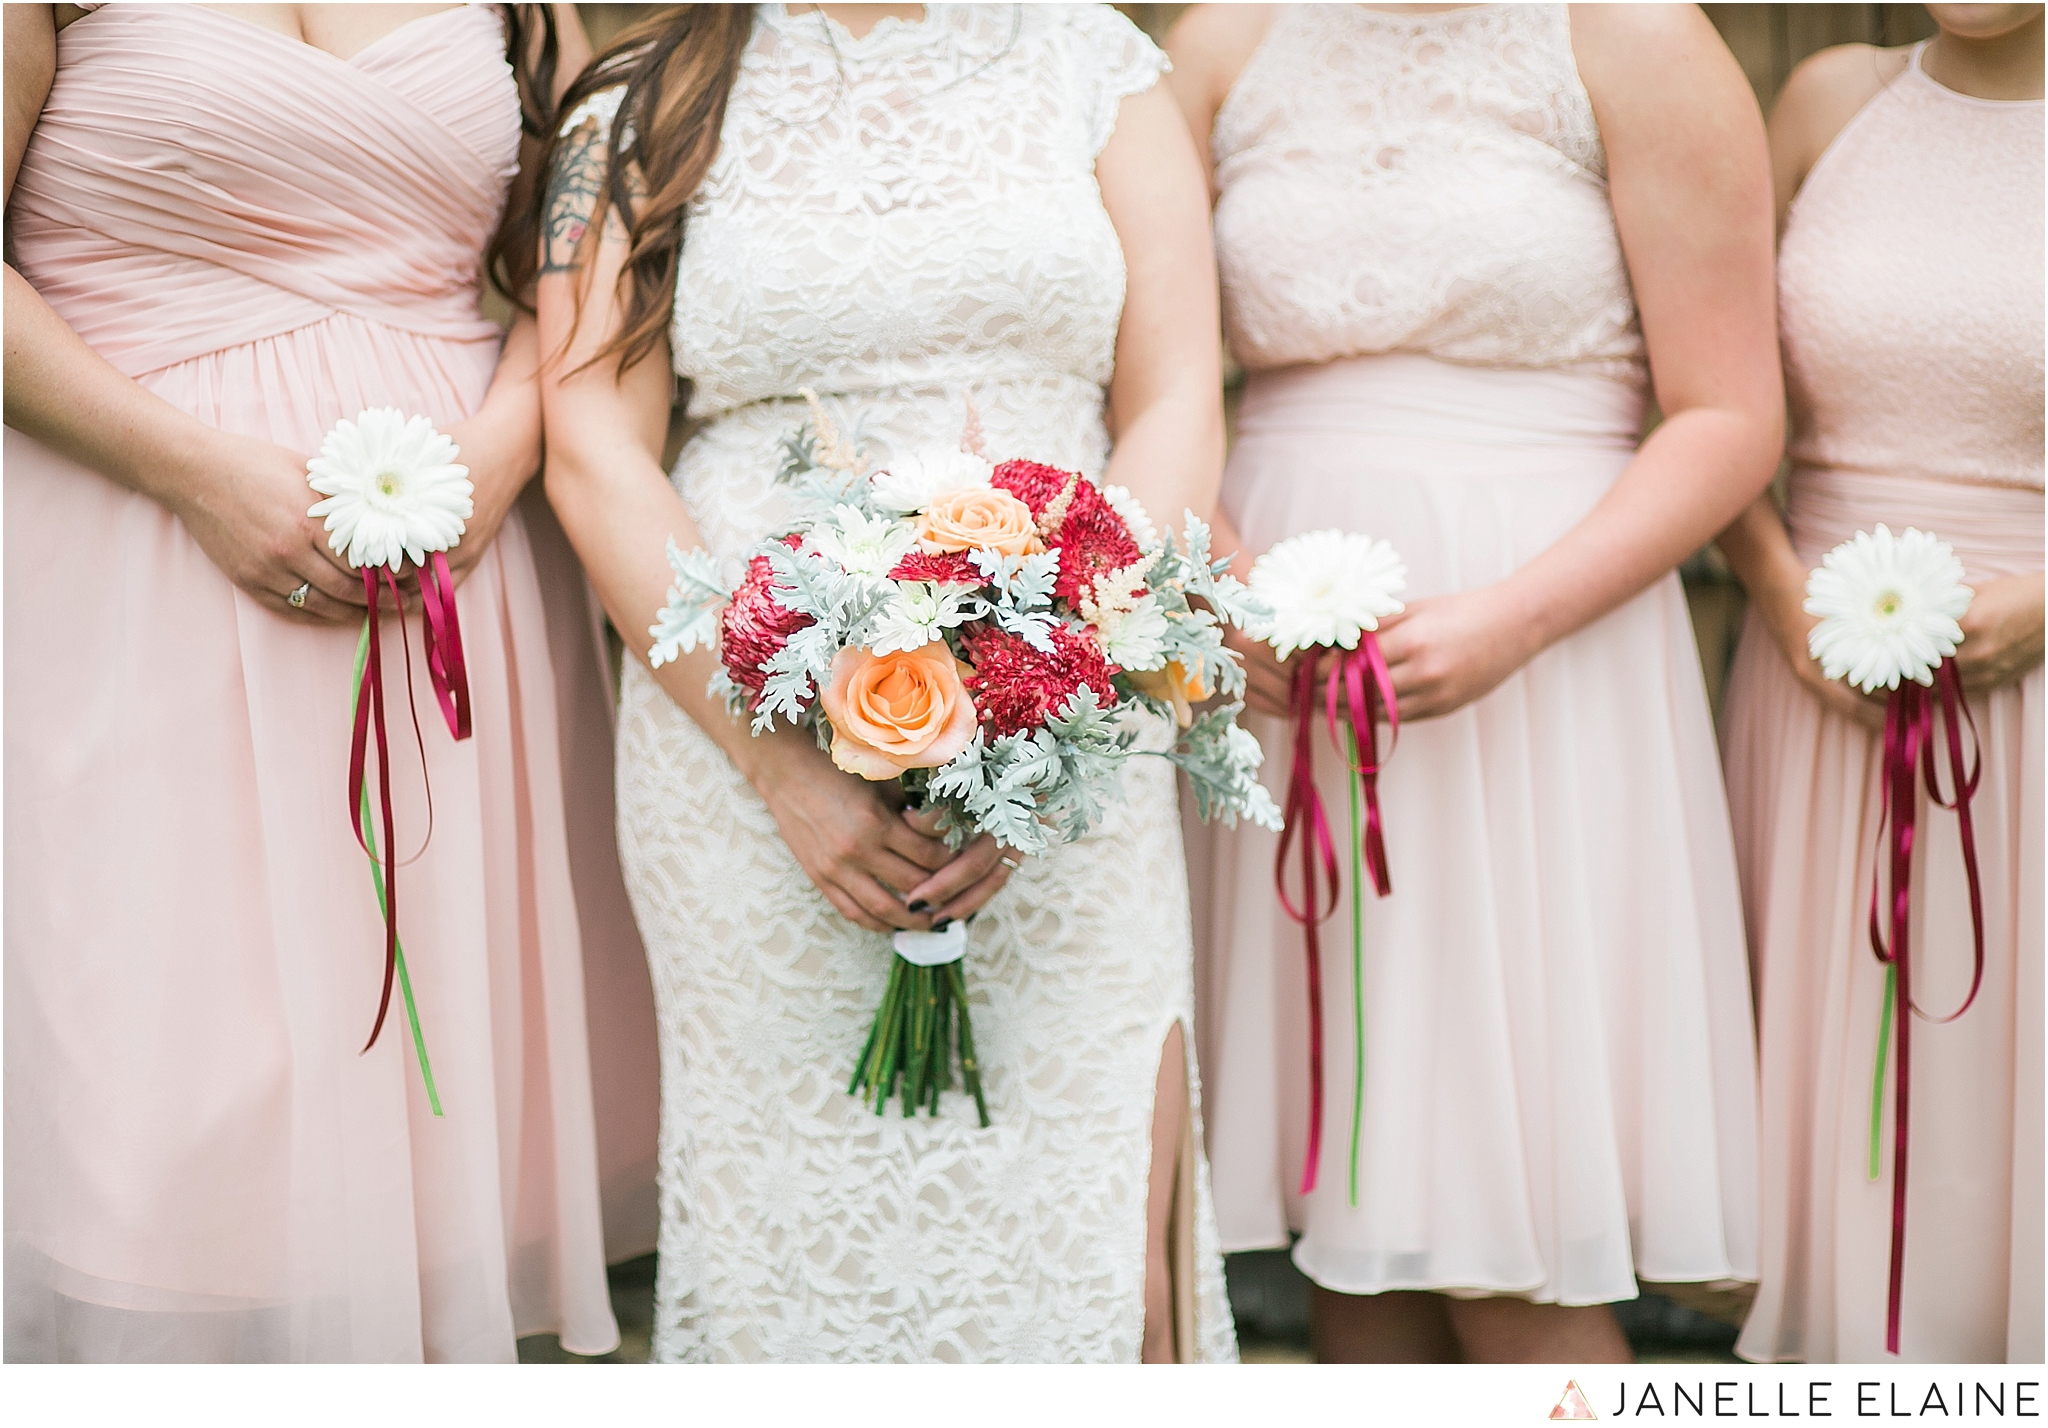 janelle elaine photography-seattle-destination-wedding-photographer-49.jpg